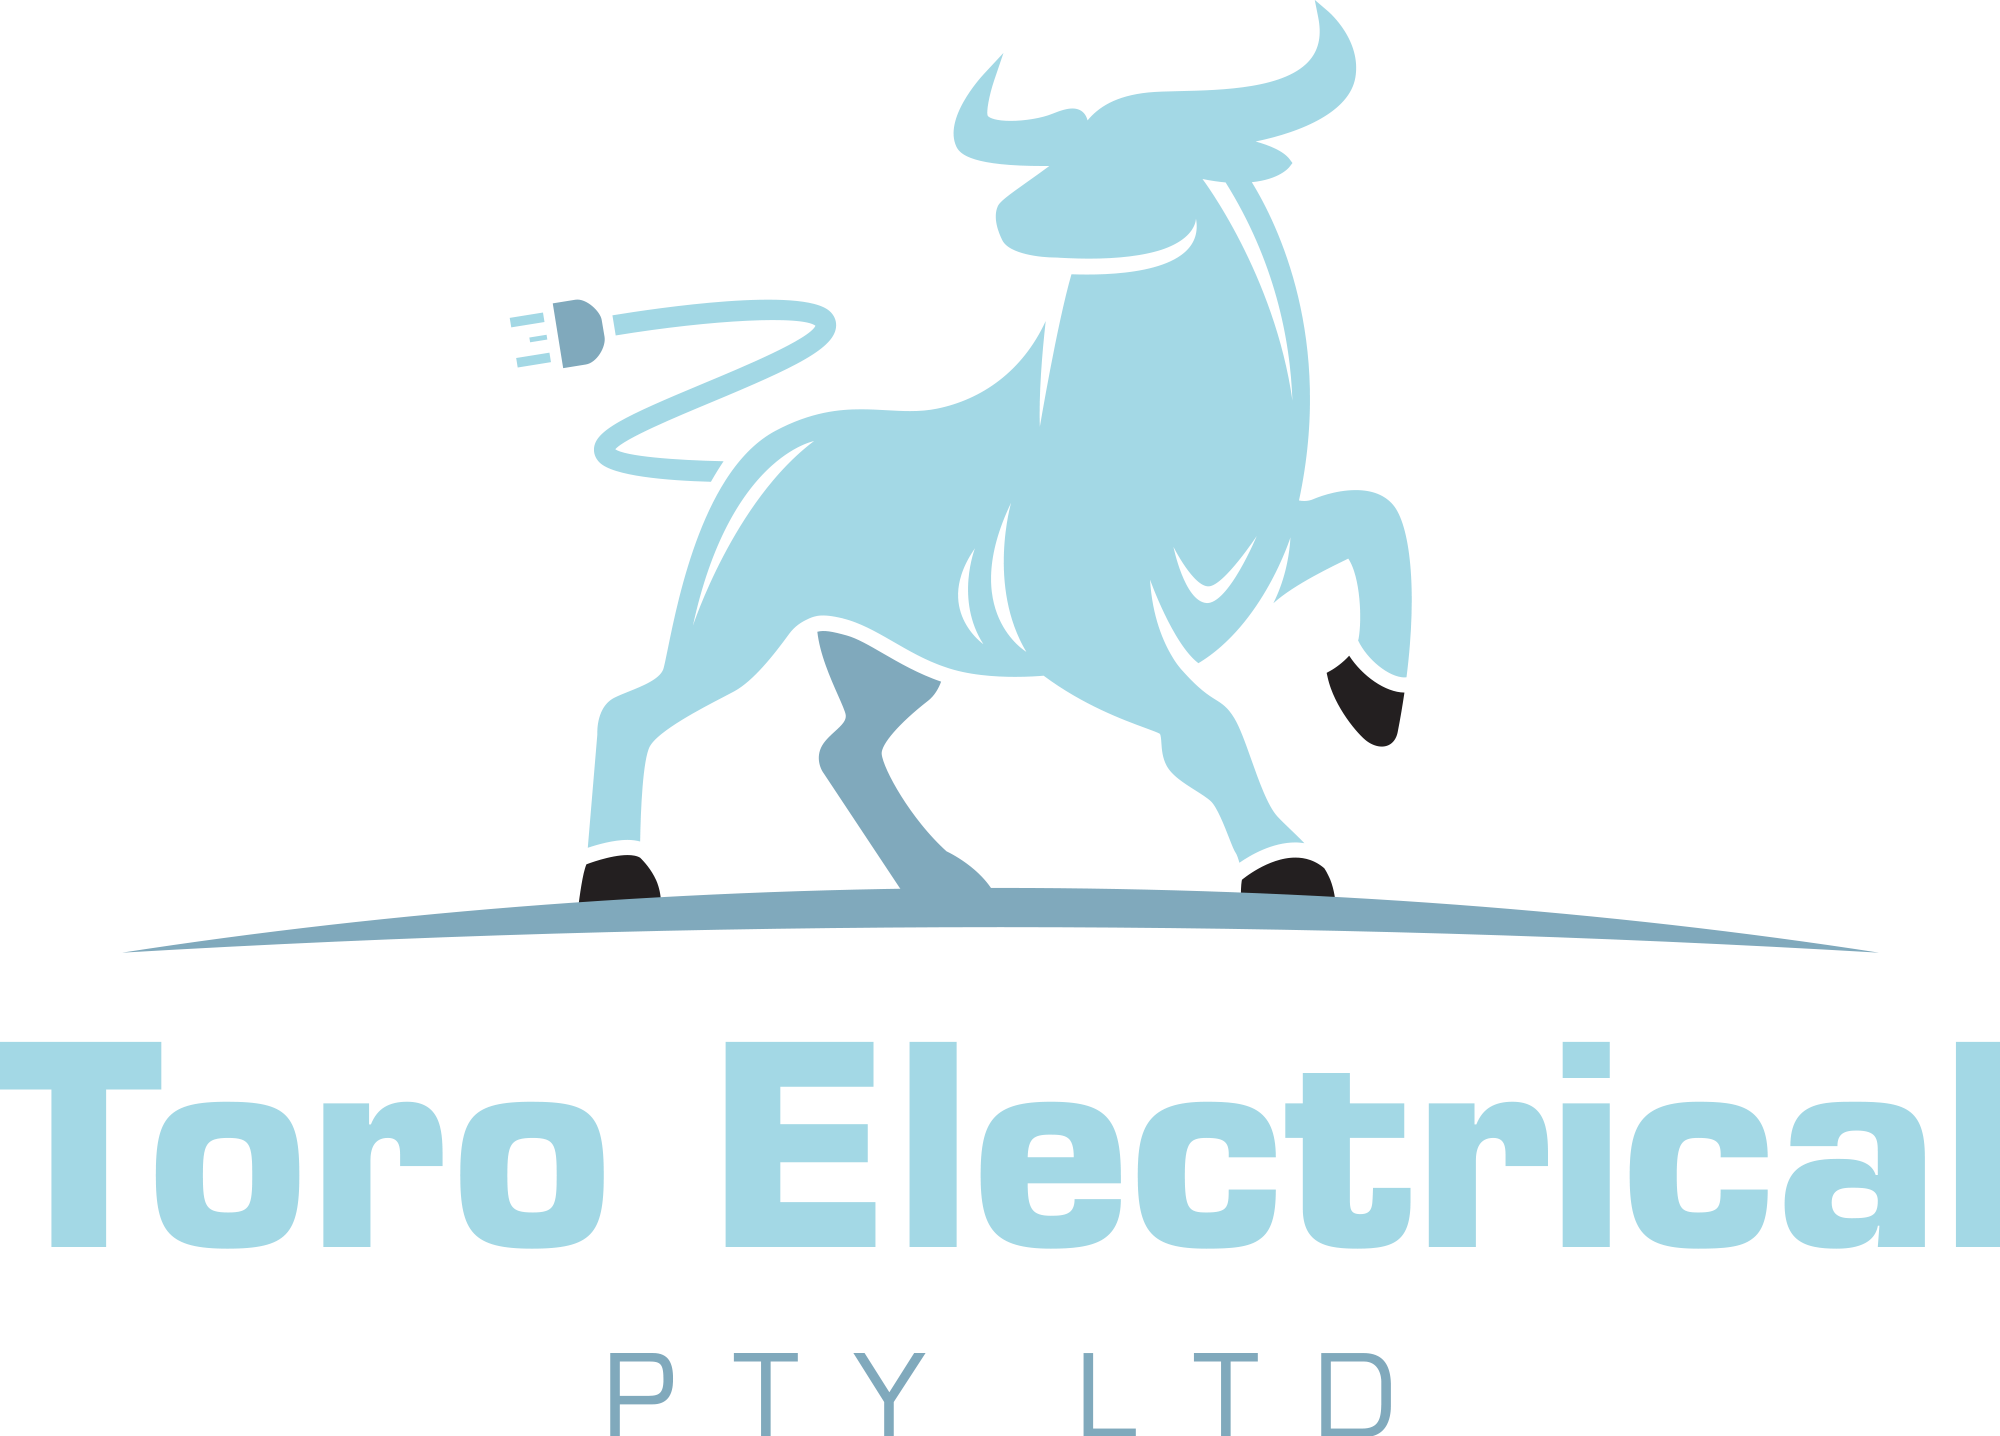 Toro Electrical